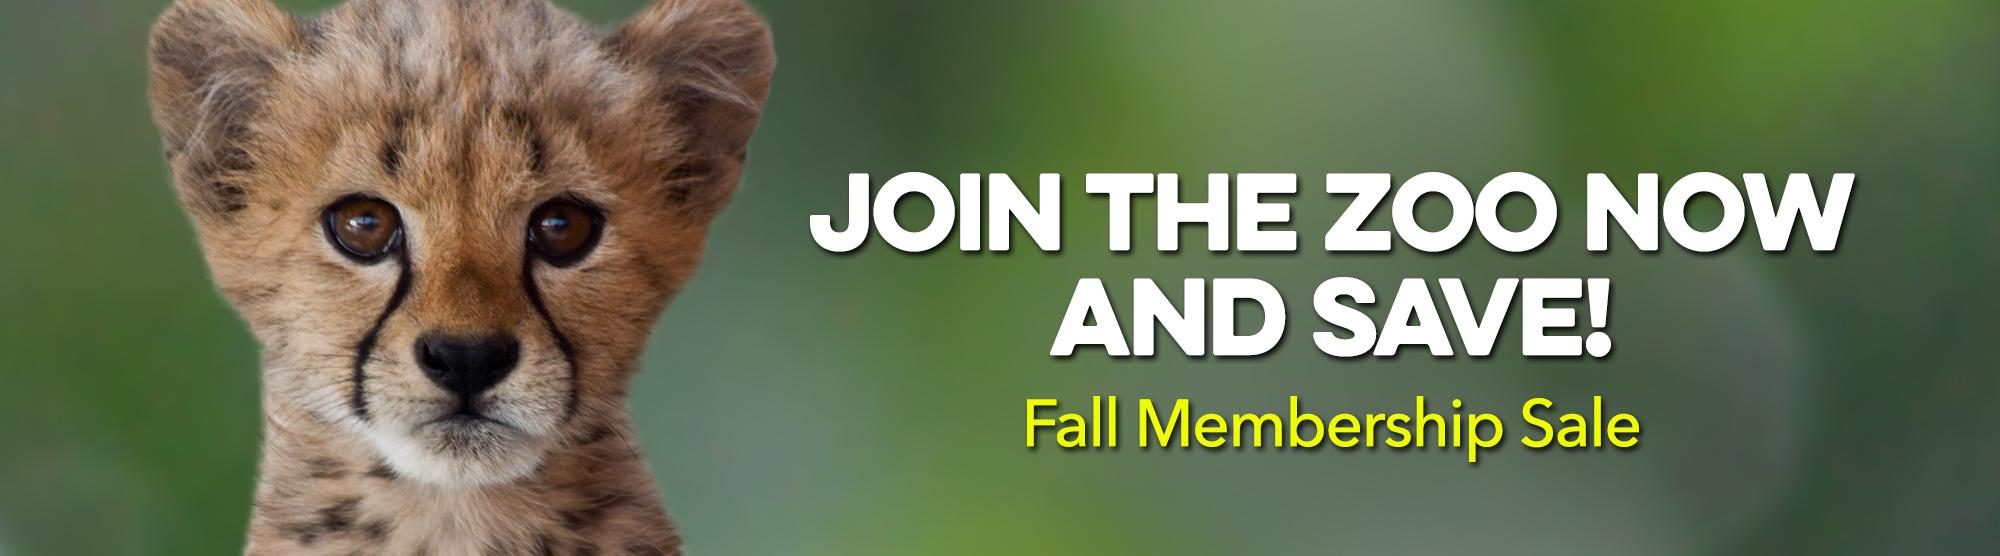 10% off all memberships during fall membership sale